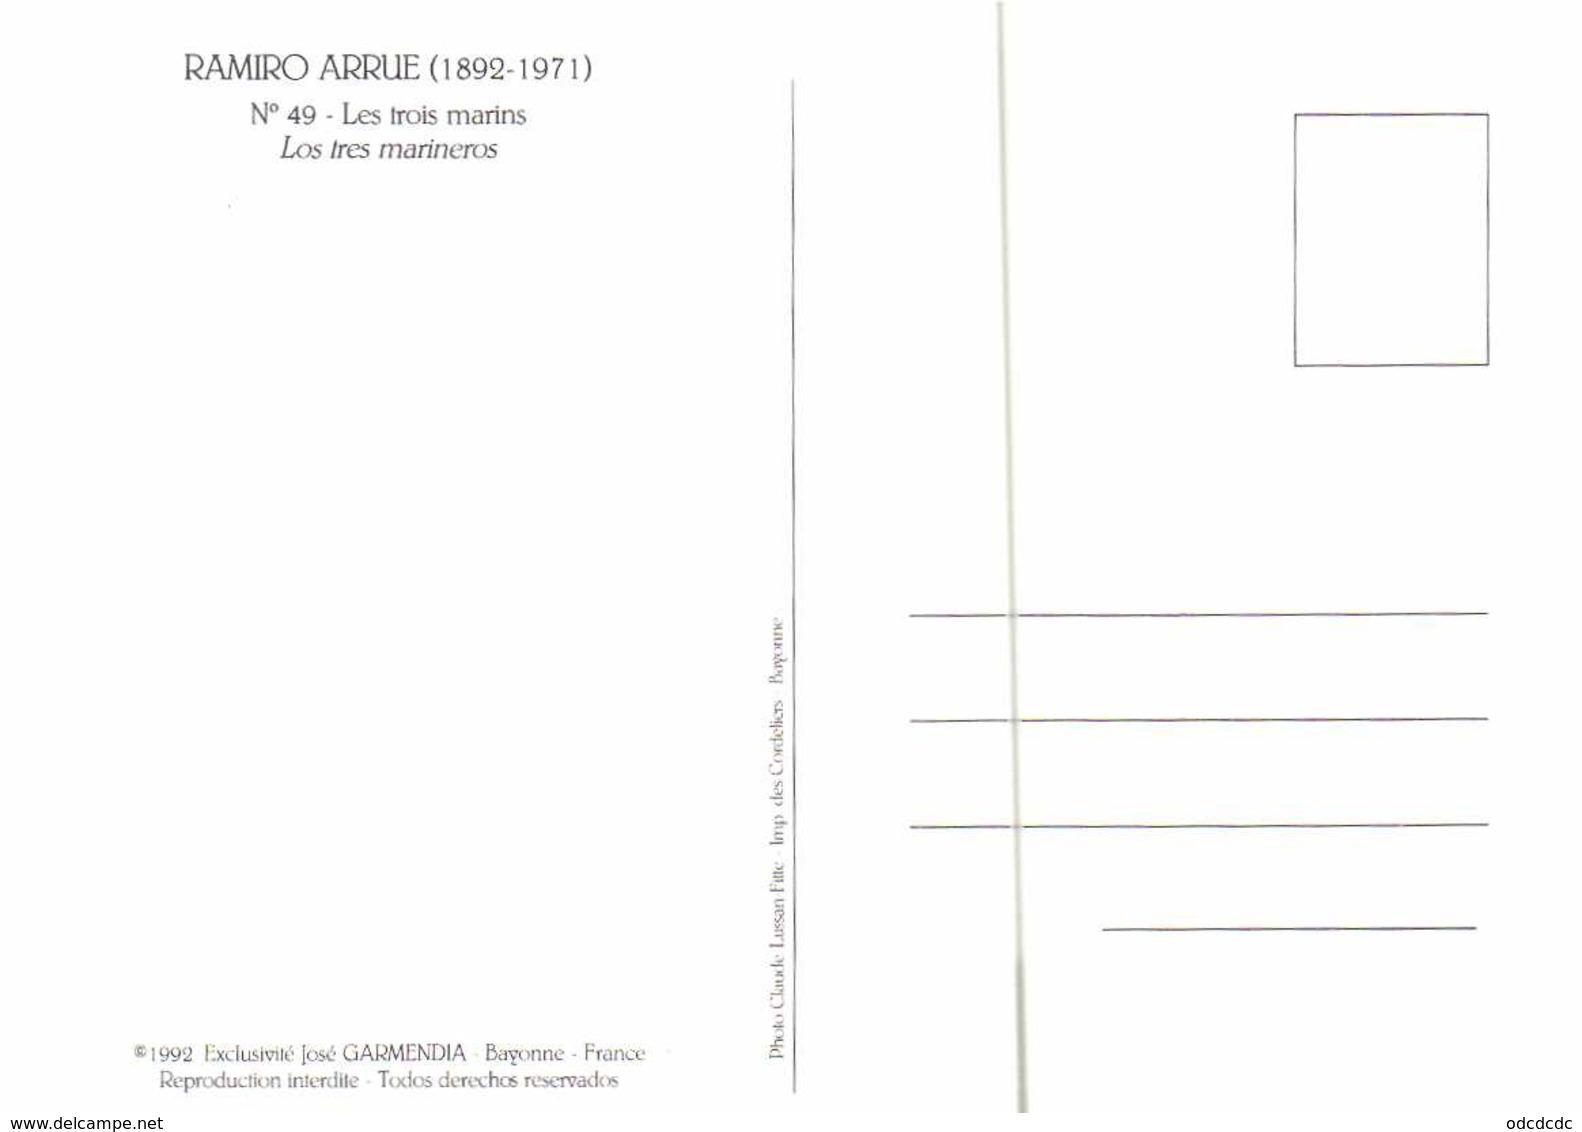 Ramiro Arrue Les Trois Marins Los Tres Marineros  RV - Unclassified